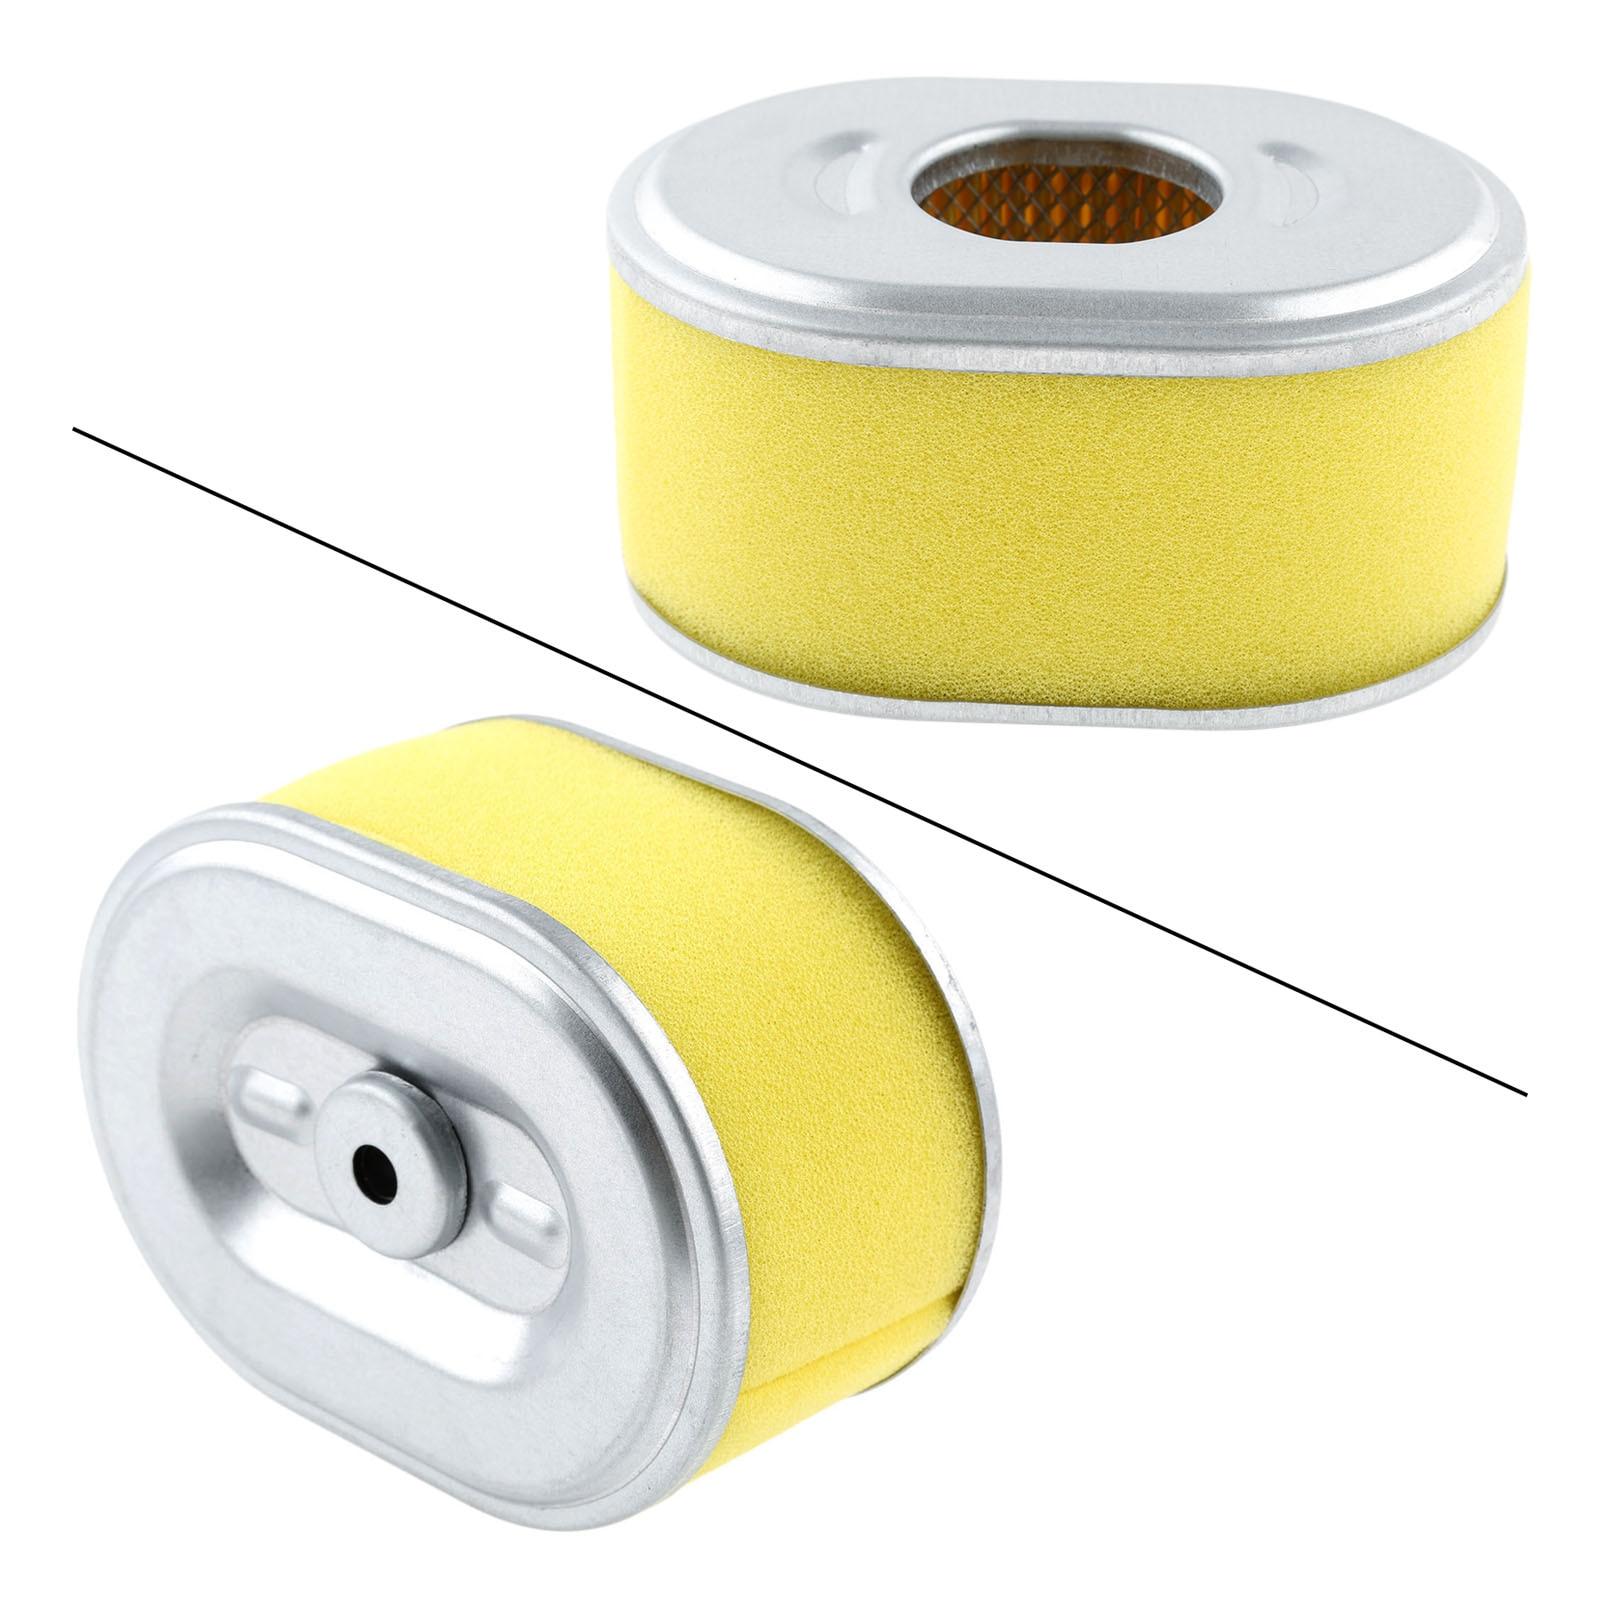 VADIA 1 Pc Air Filter Cleaner Para Honda GX110 GX120 Substitui 17210-ZE0-822 17210-ZE0-505 17210-ZE0-820